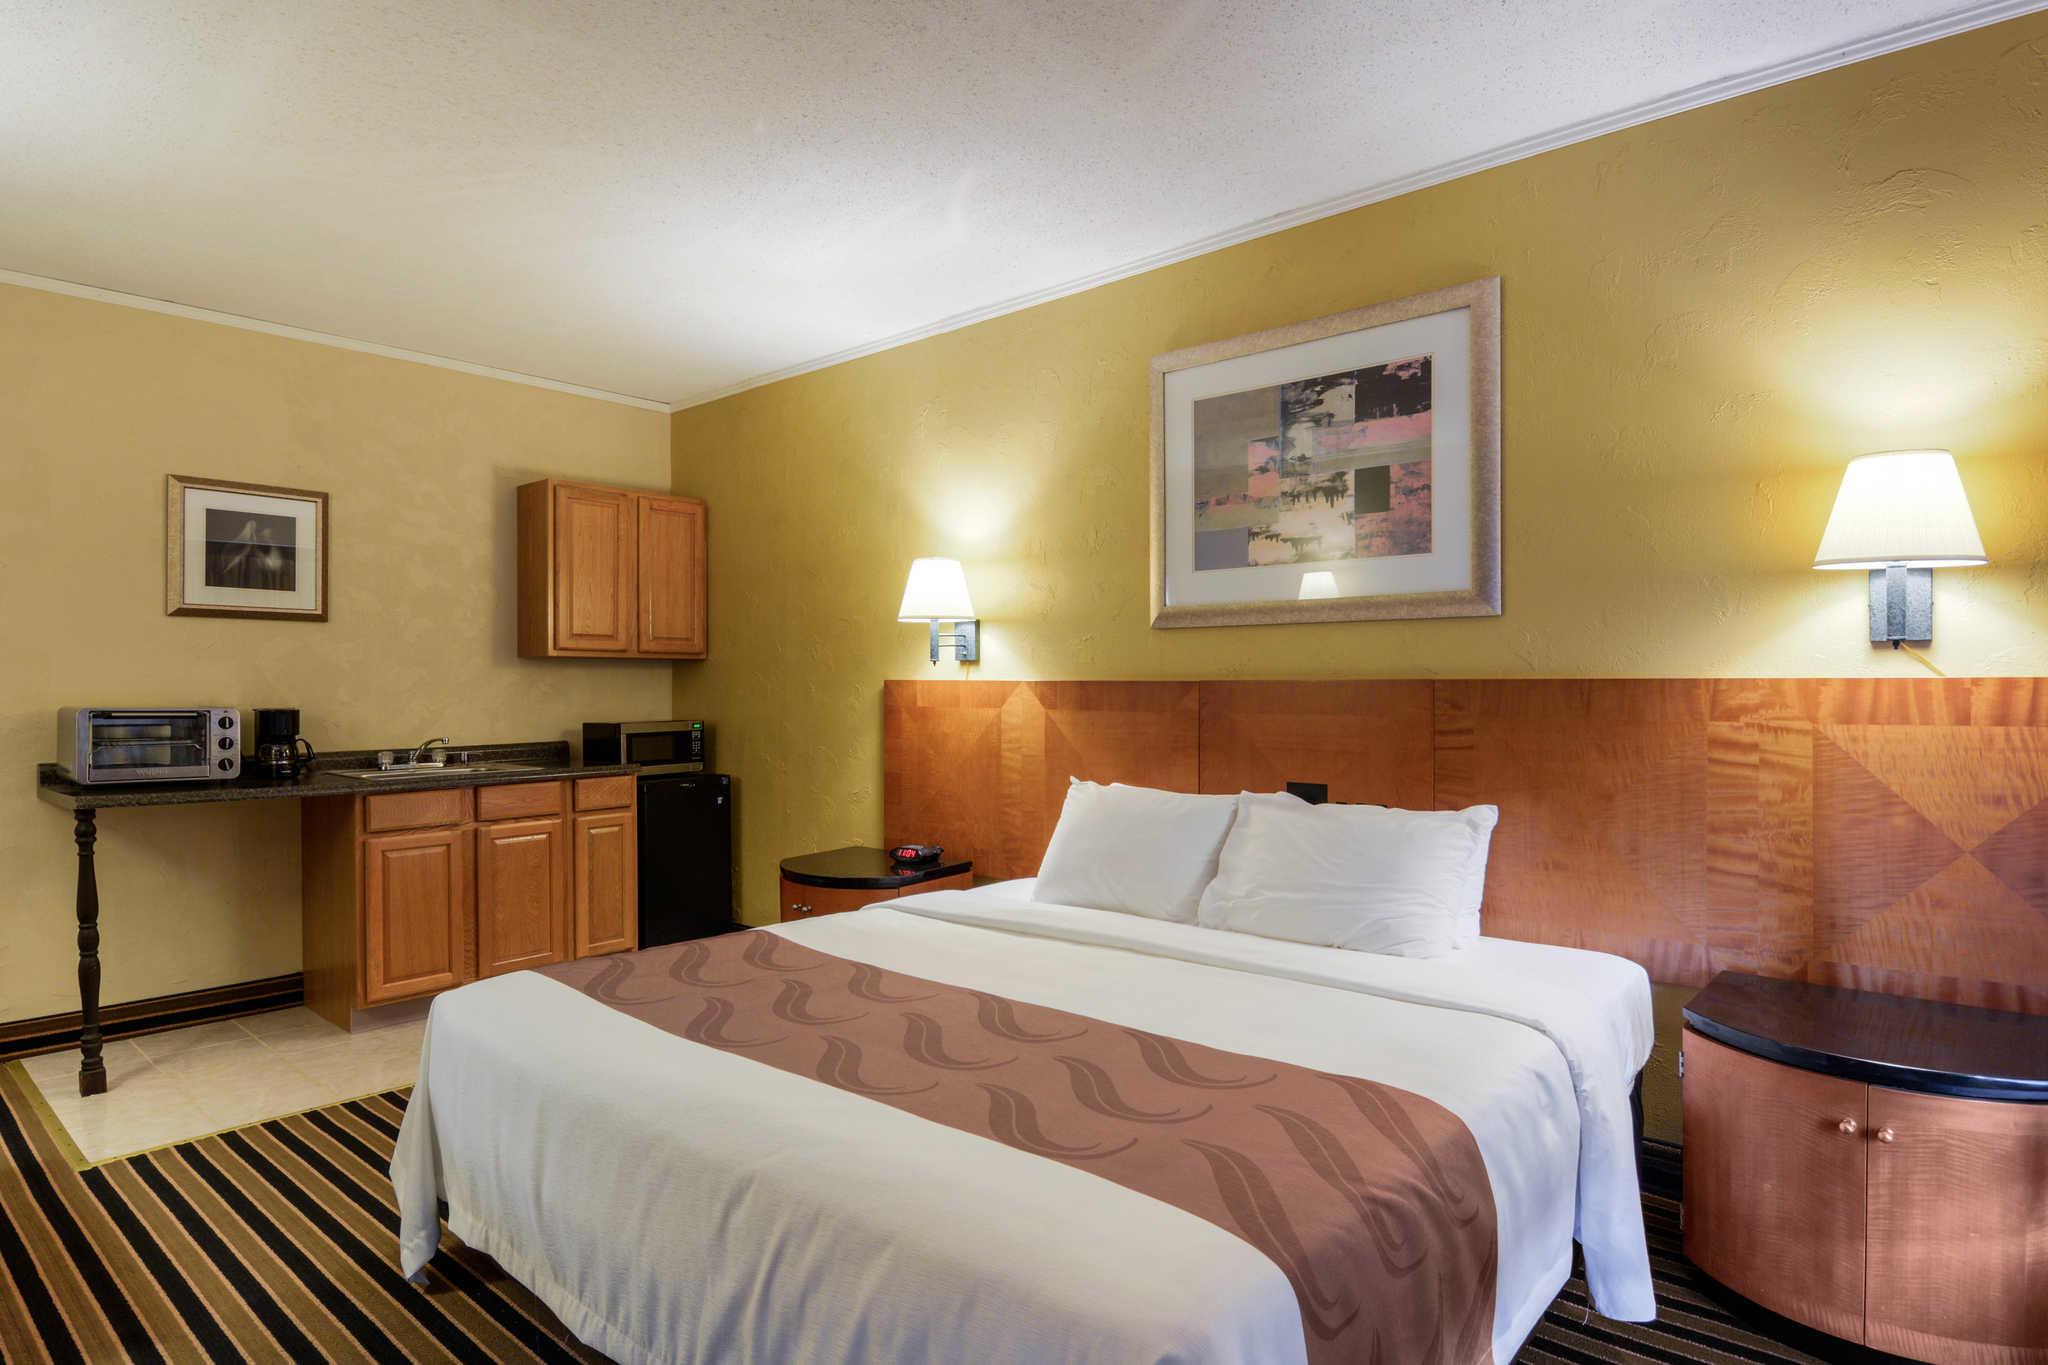 Quality Inn Skyline Drive image 10